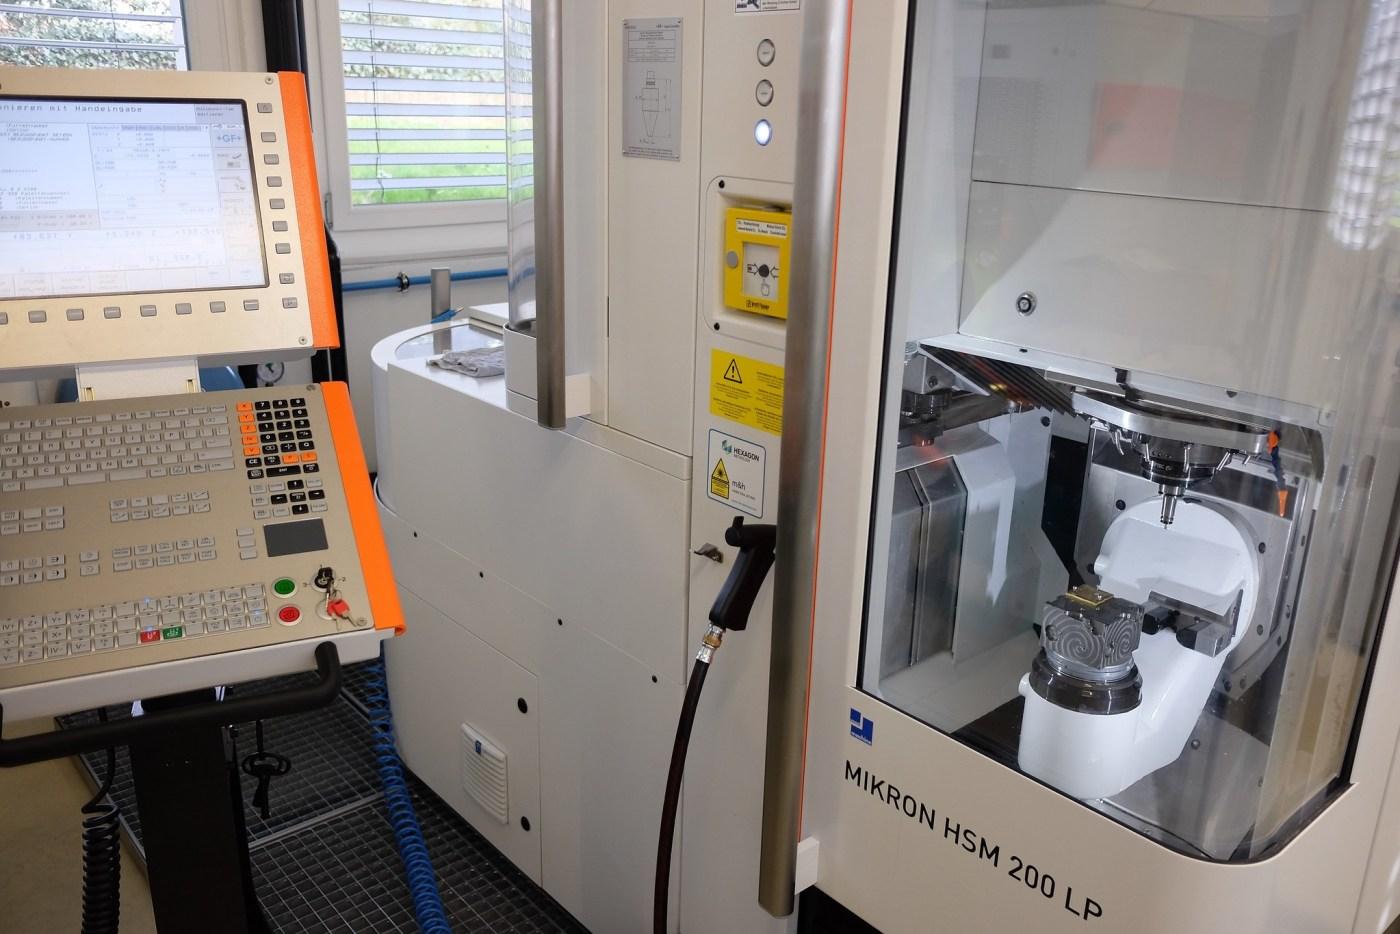 CNC machine at Armin Strom